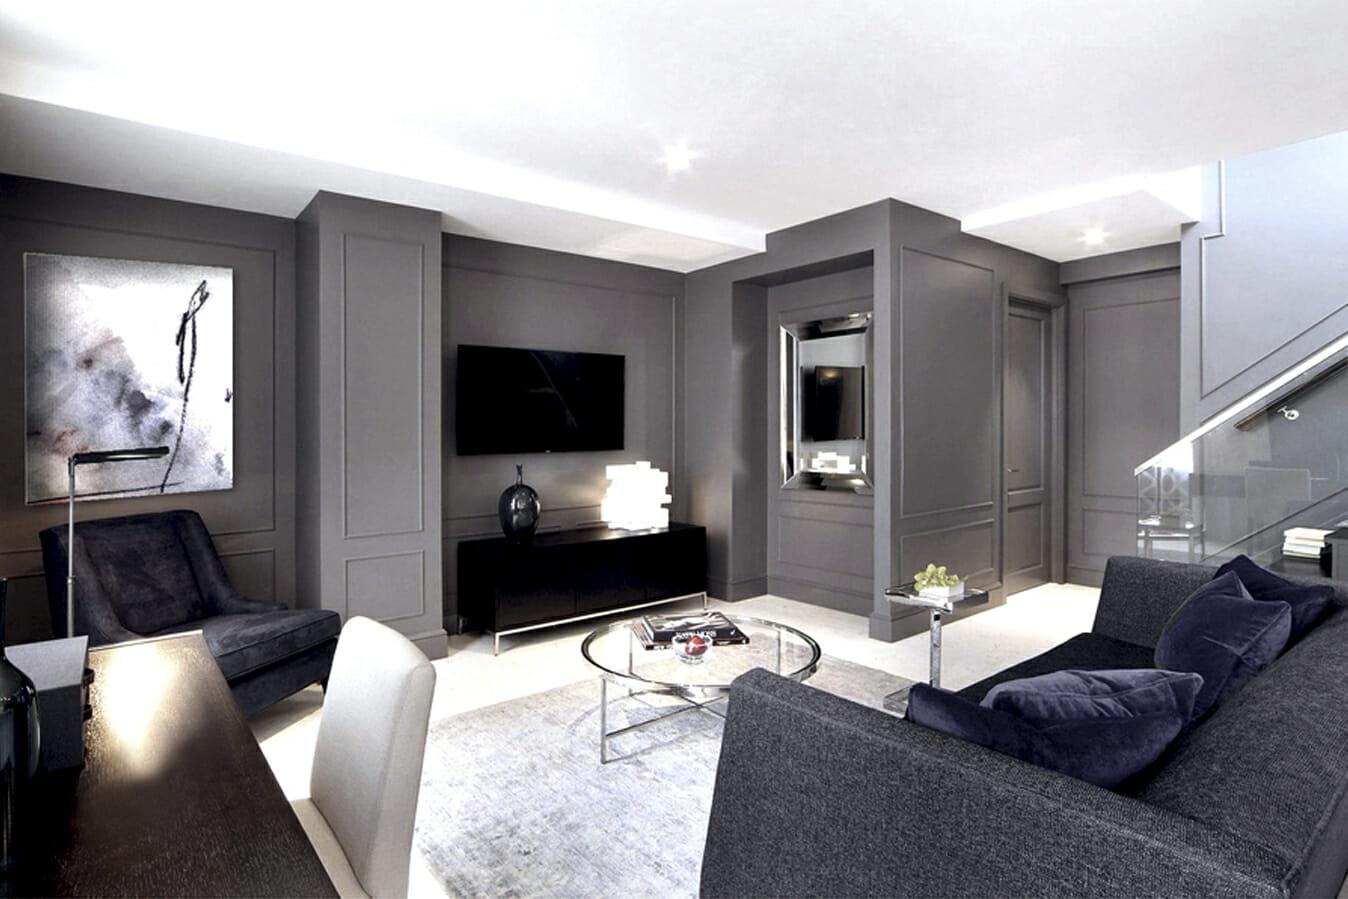 Modern Living Room San Francisco Best Interior Design 12: Modern Interior Design: 10 Best Tips For Creating